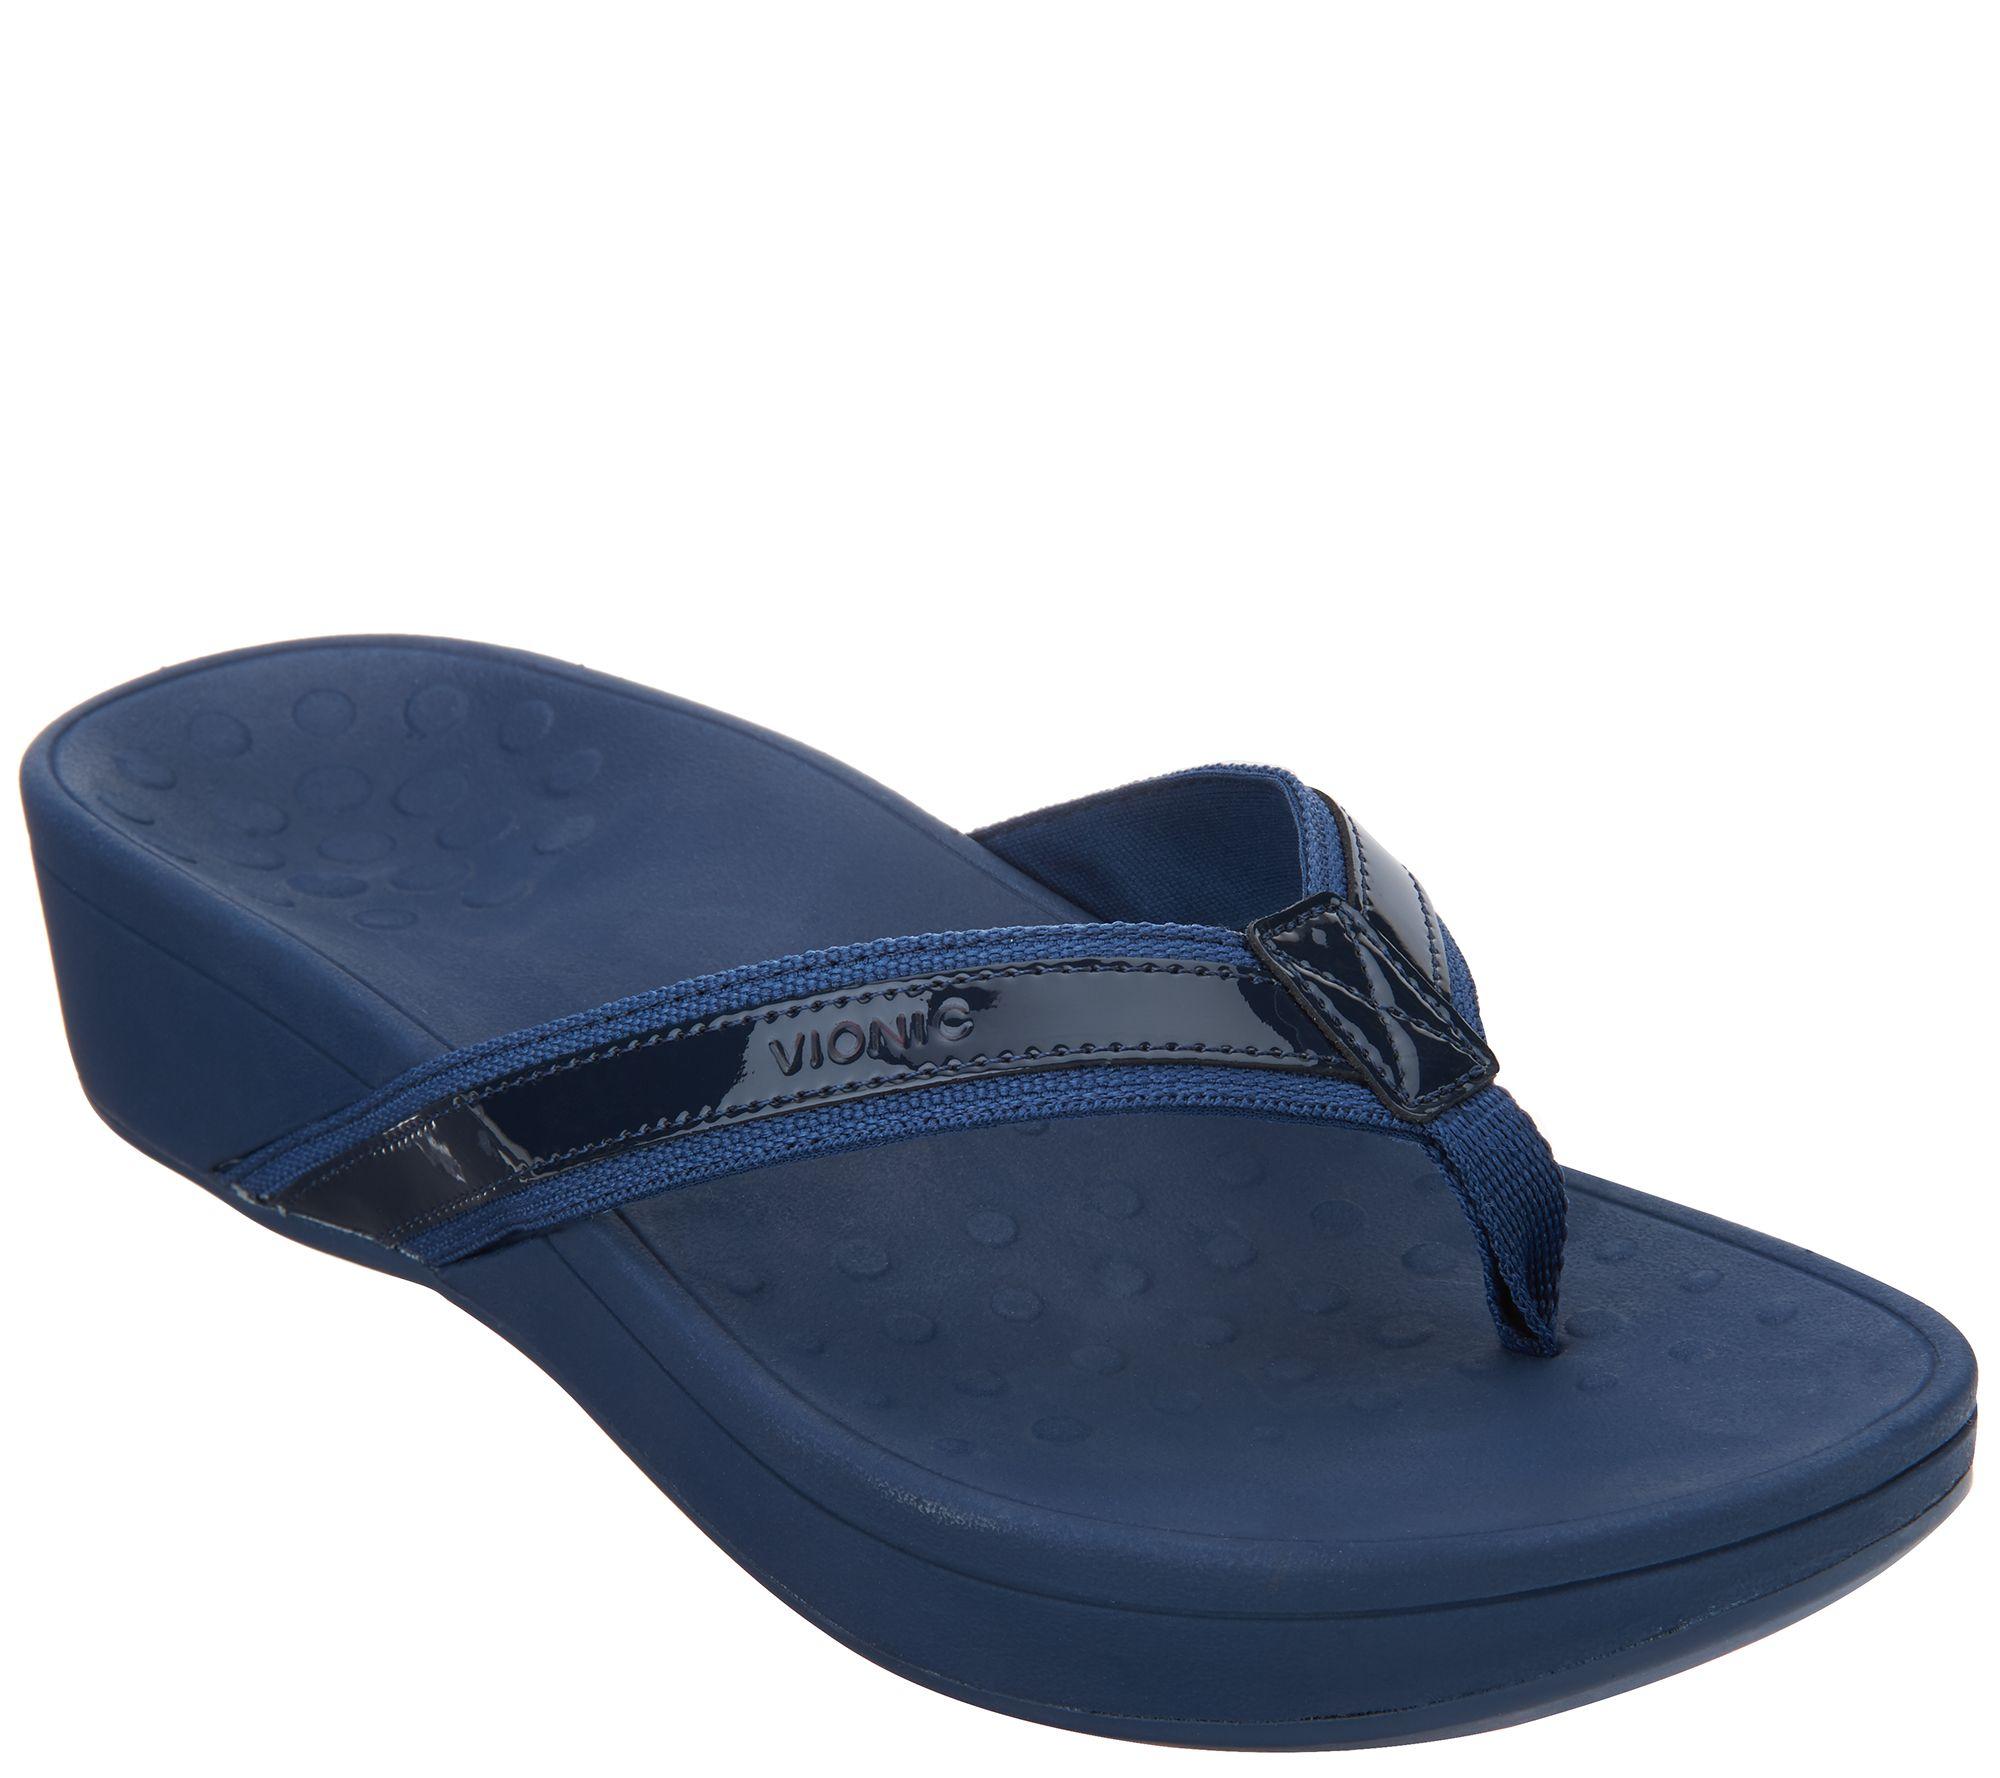 342e564efdc57 Vionic Platform Leather Sandals - High Tide - Page 1 — QVC.com